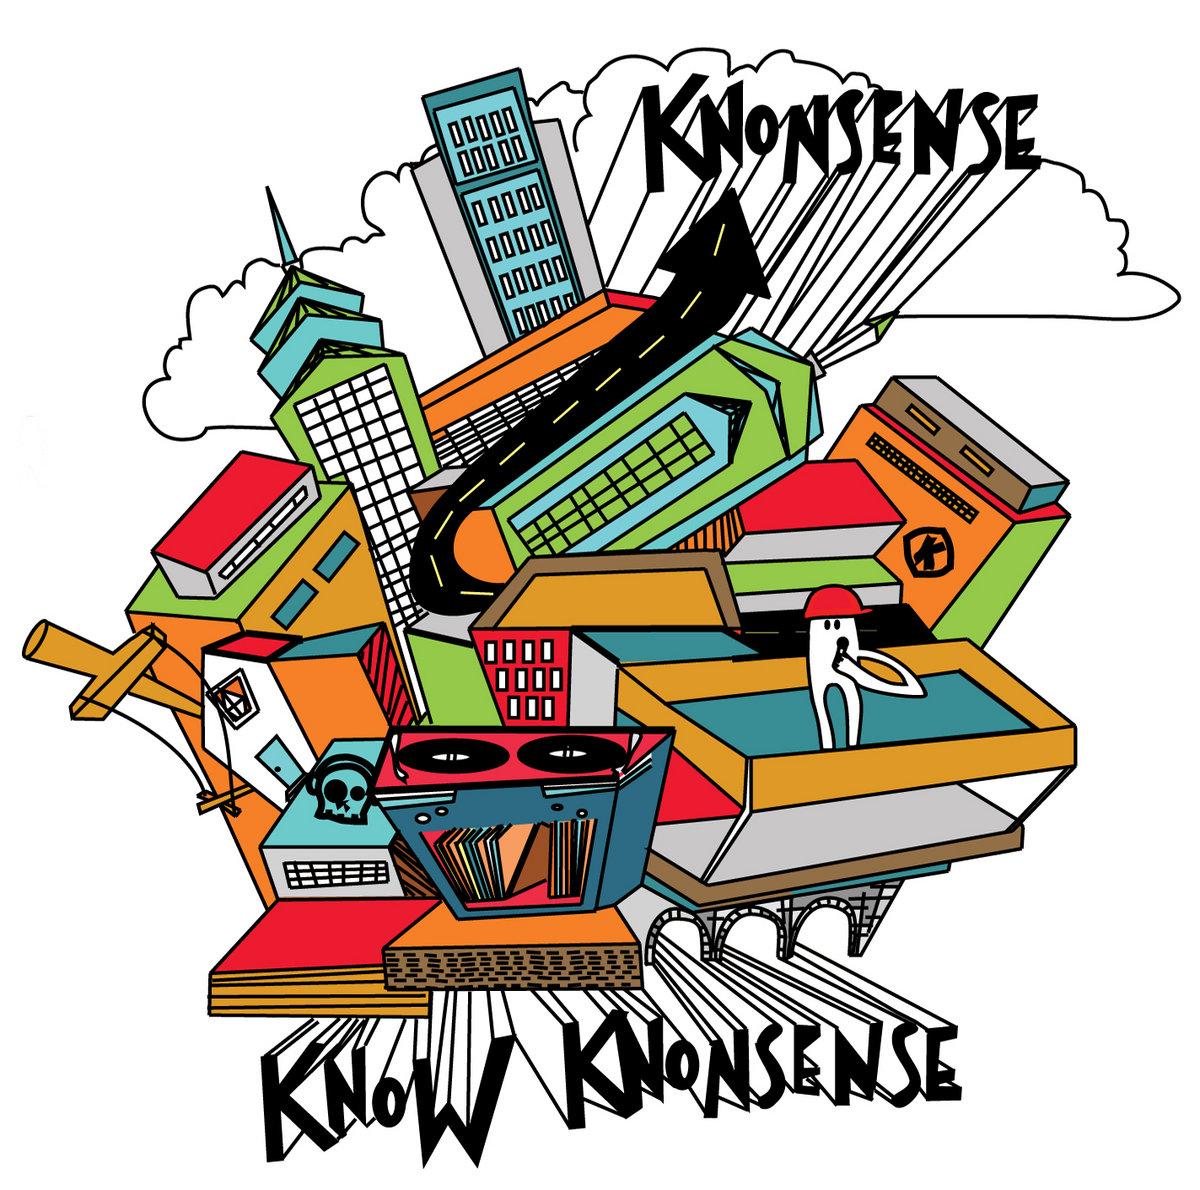 sit back, relax | knonsense